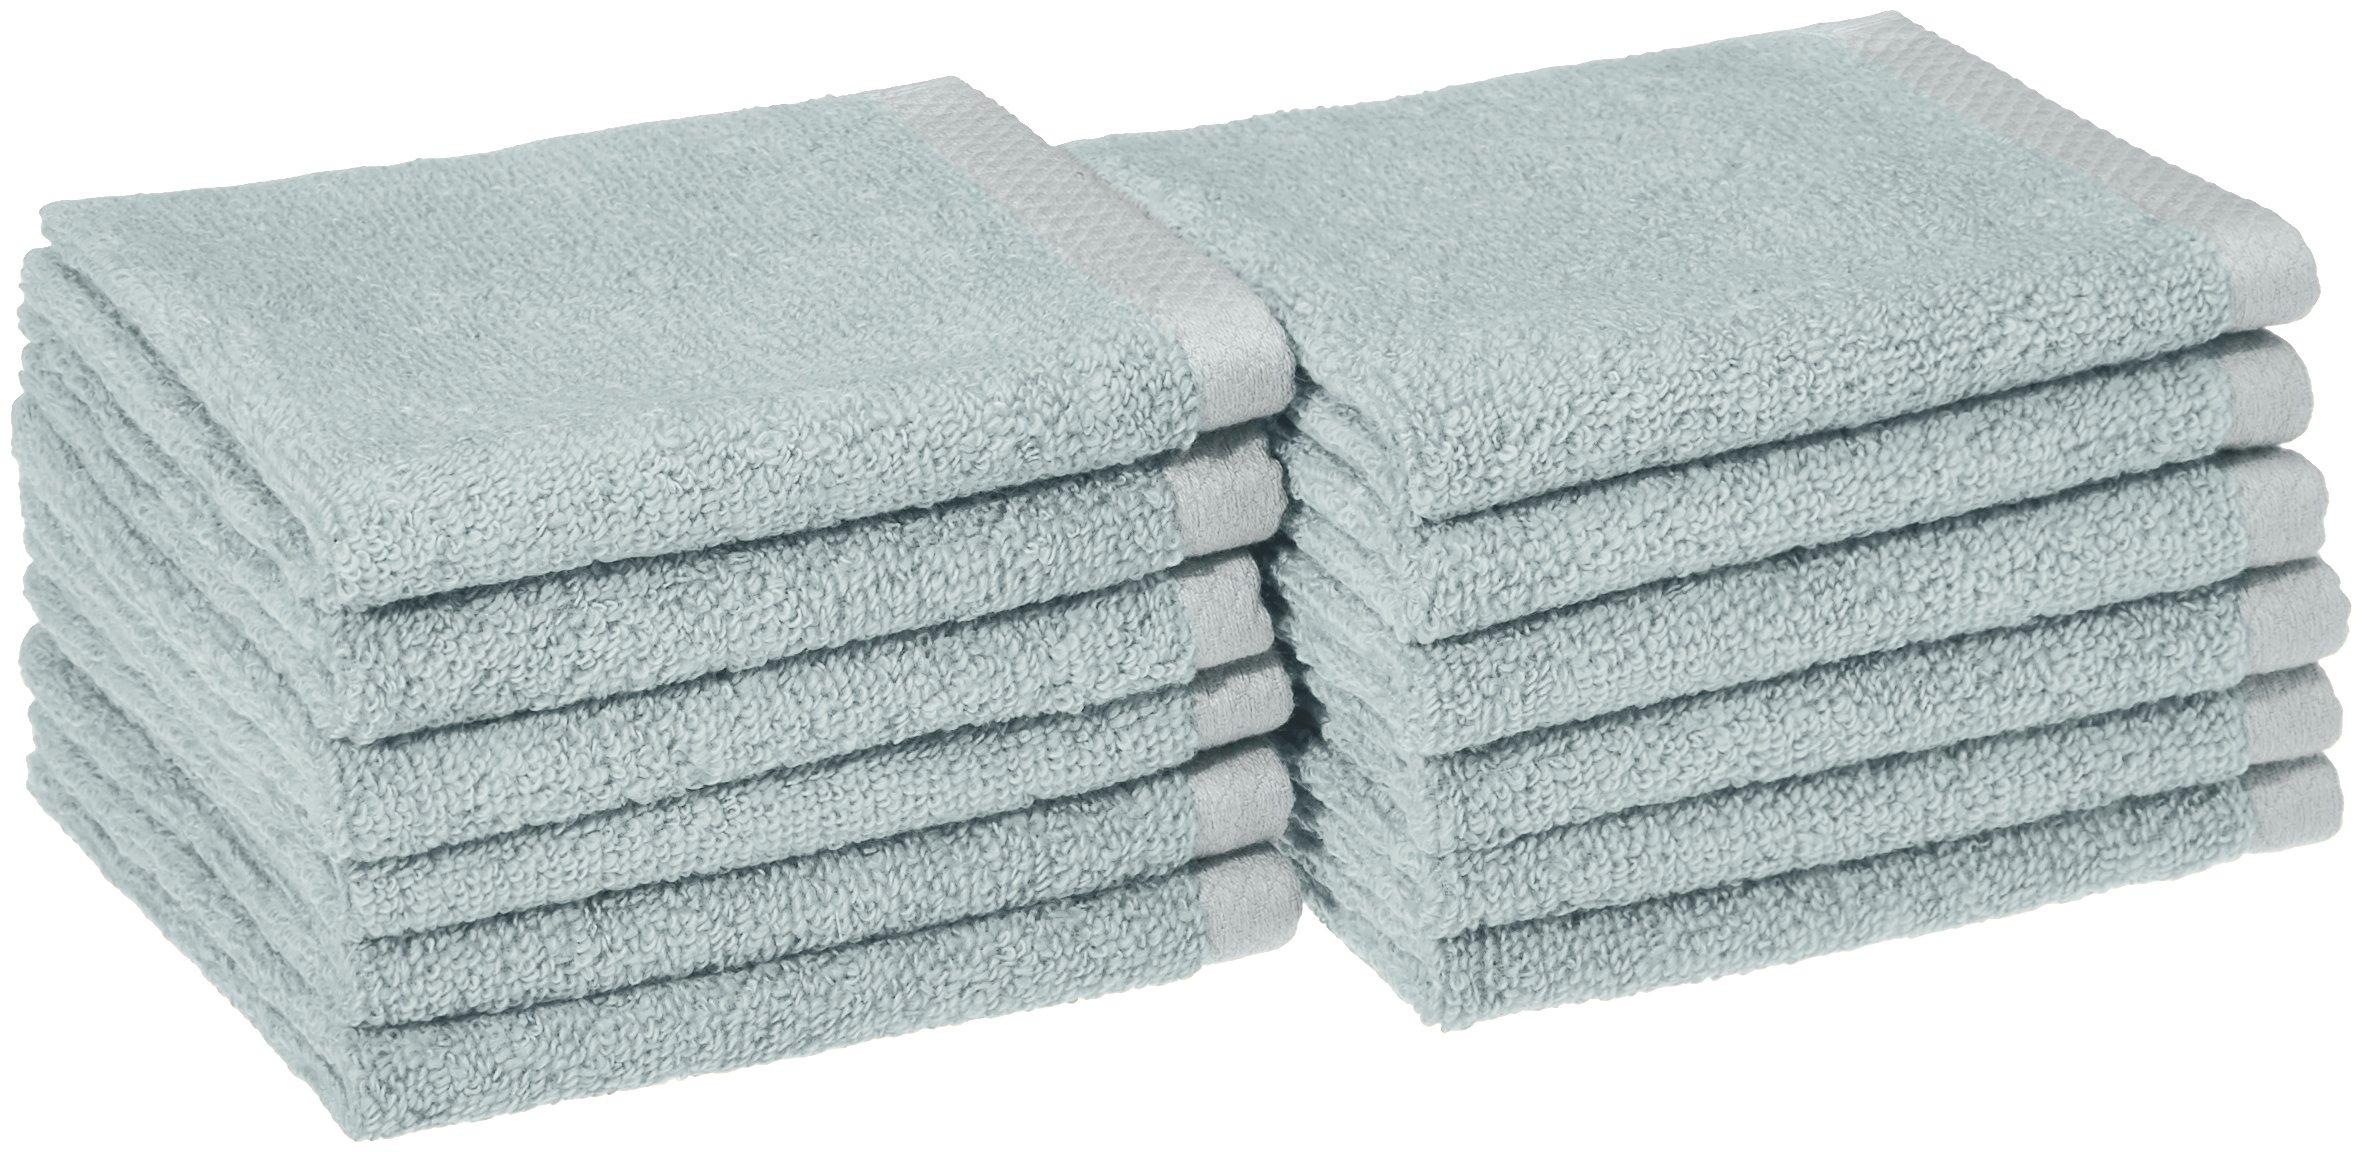 AmazonBasics Quick-Dry, Luxurious, Soft, 100% Cotton Towels, Ice Blue - Set of 12 Washcloths